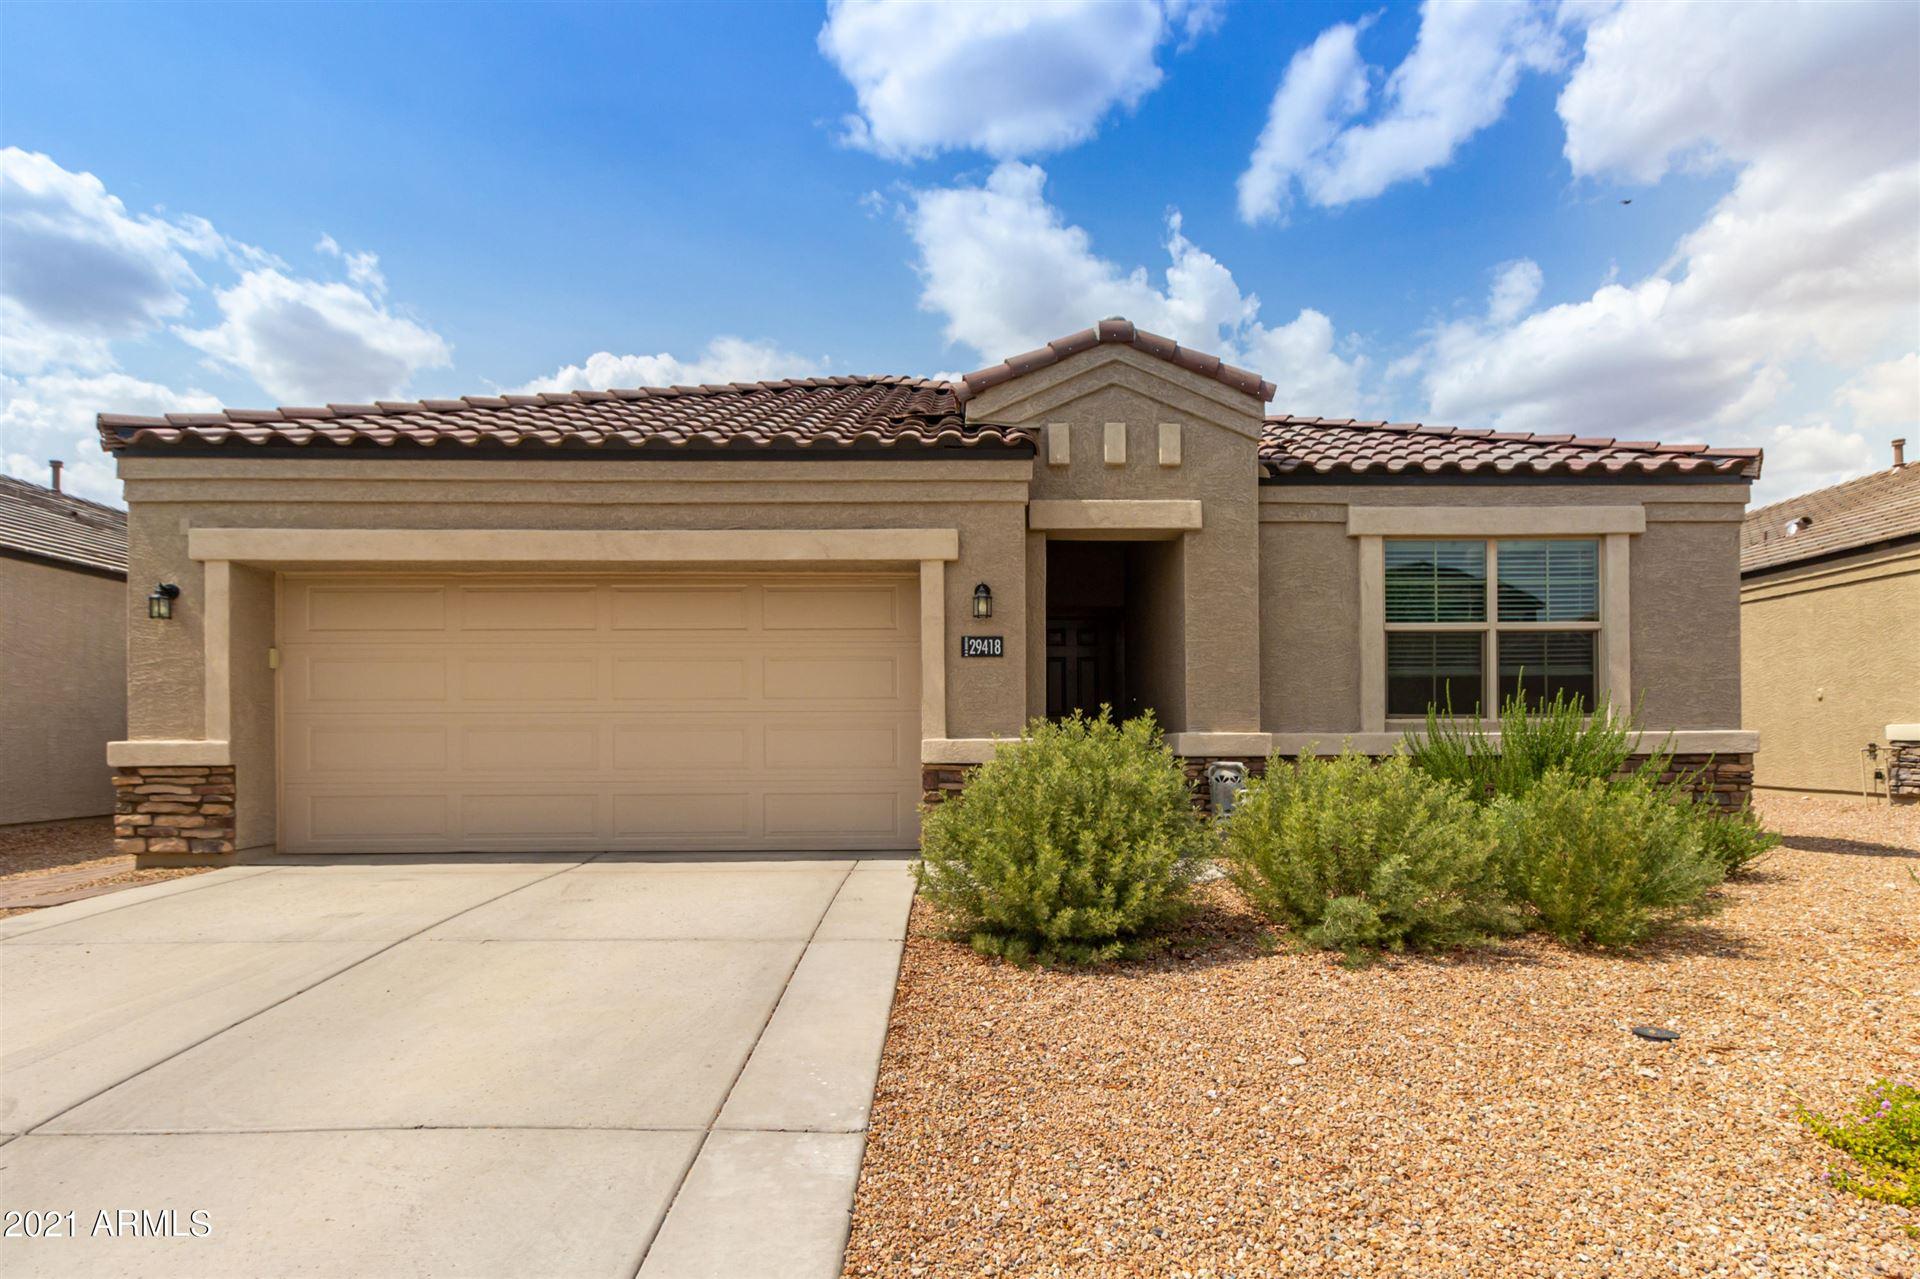 Photo of 29418 W WELDON Avenue, Buckeye, AZ 85396 (MLS # 6265937)